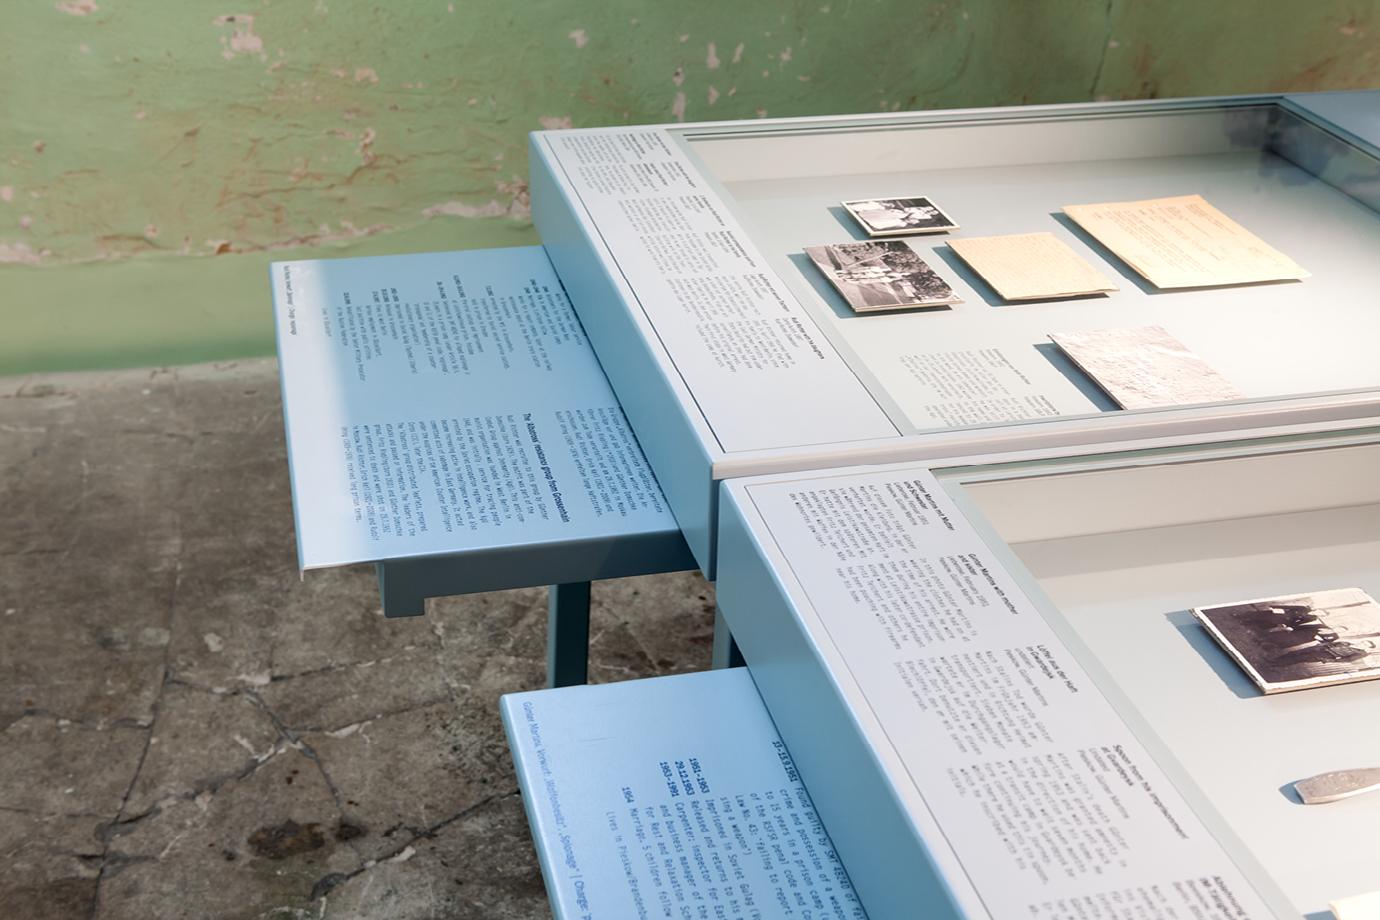 http://e-o-t.de/wordpress/wp-content/uploads/2017/04/2012_eot-Leistikow-Exhibition-9.jpg